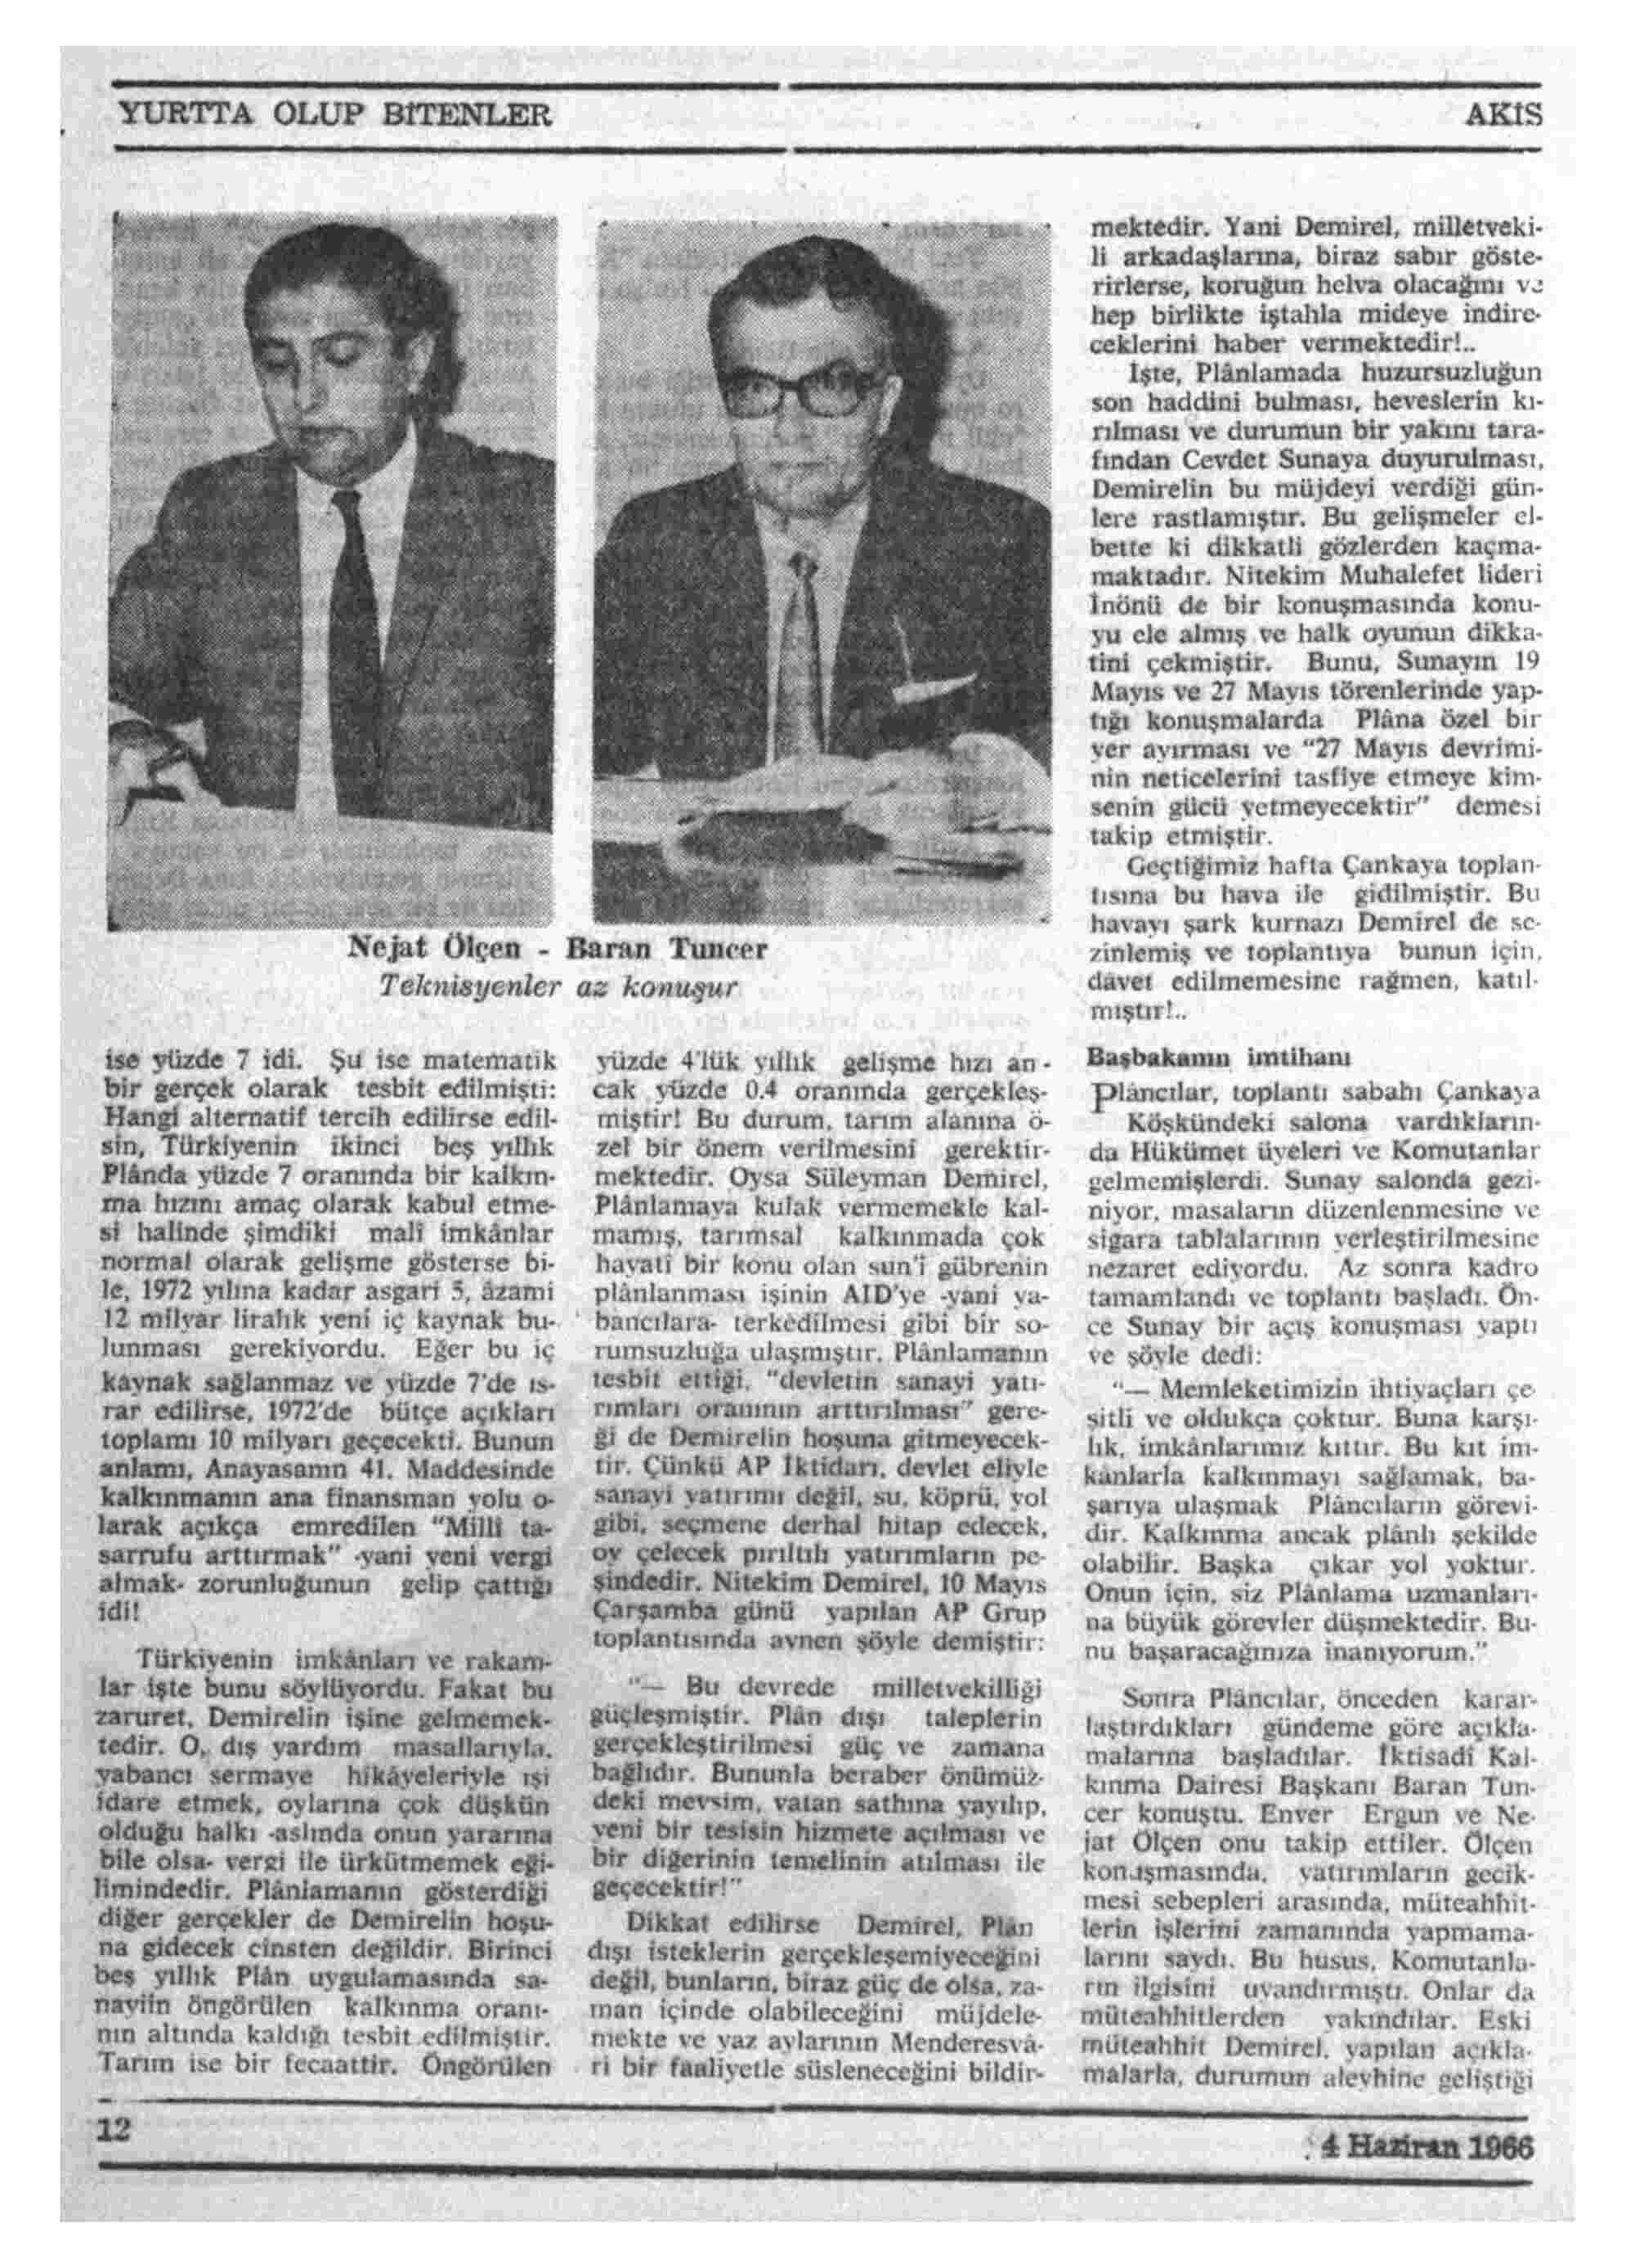 4 Haziran 1966 Tarihli Akis Dergisi Sayfa 12